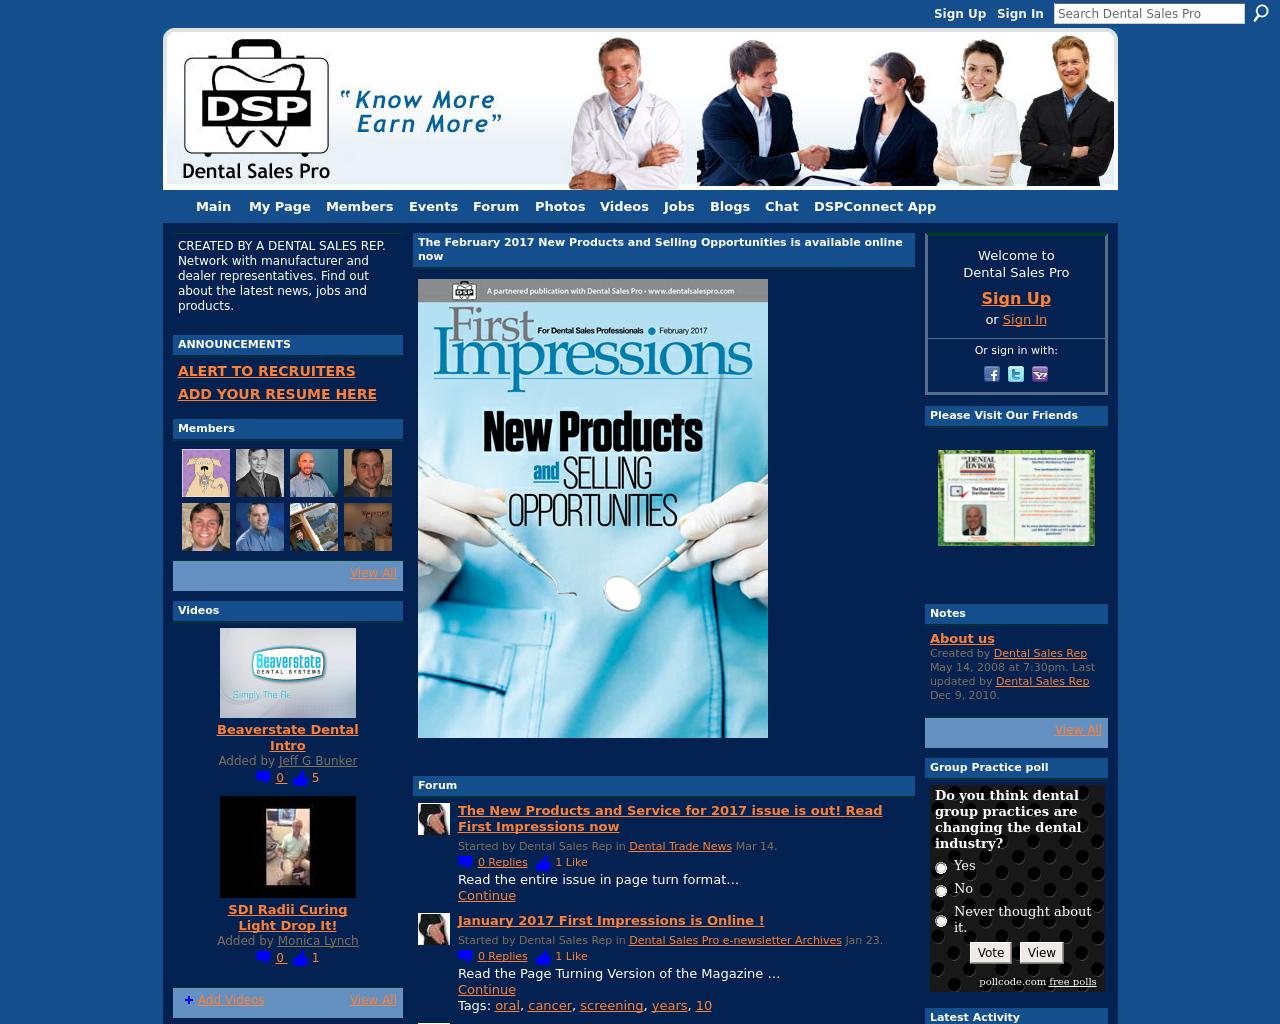 Dental-Sales-Pro-Advertising-Reviews-Pricing